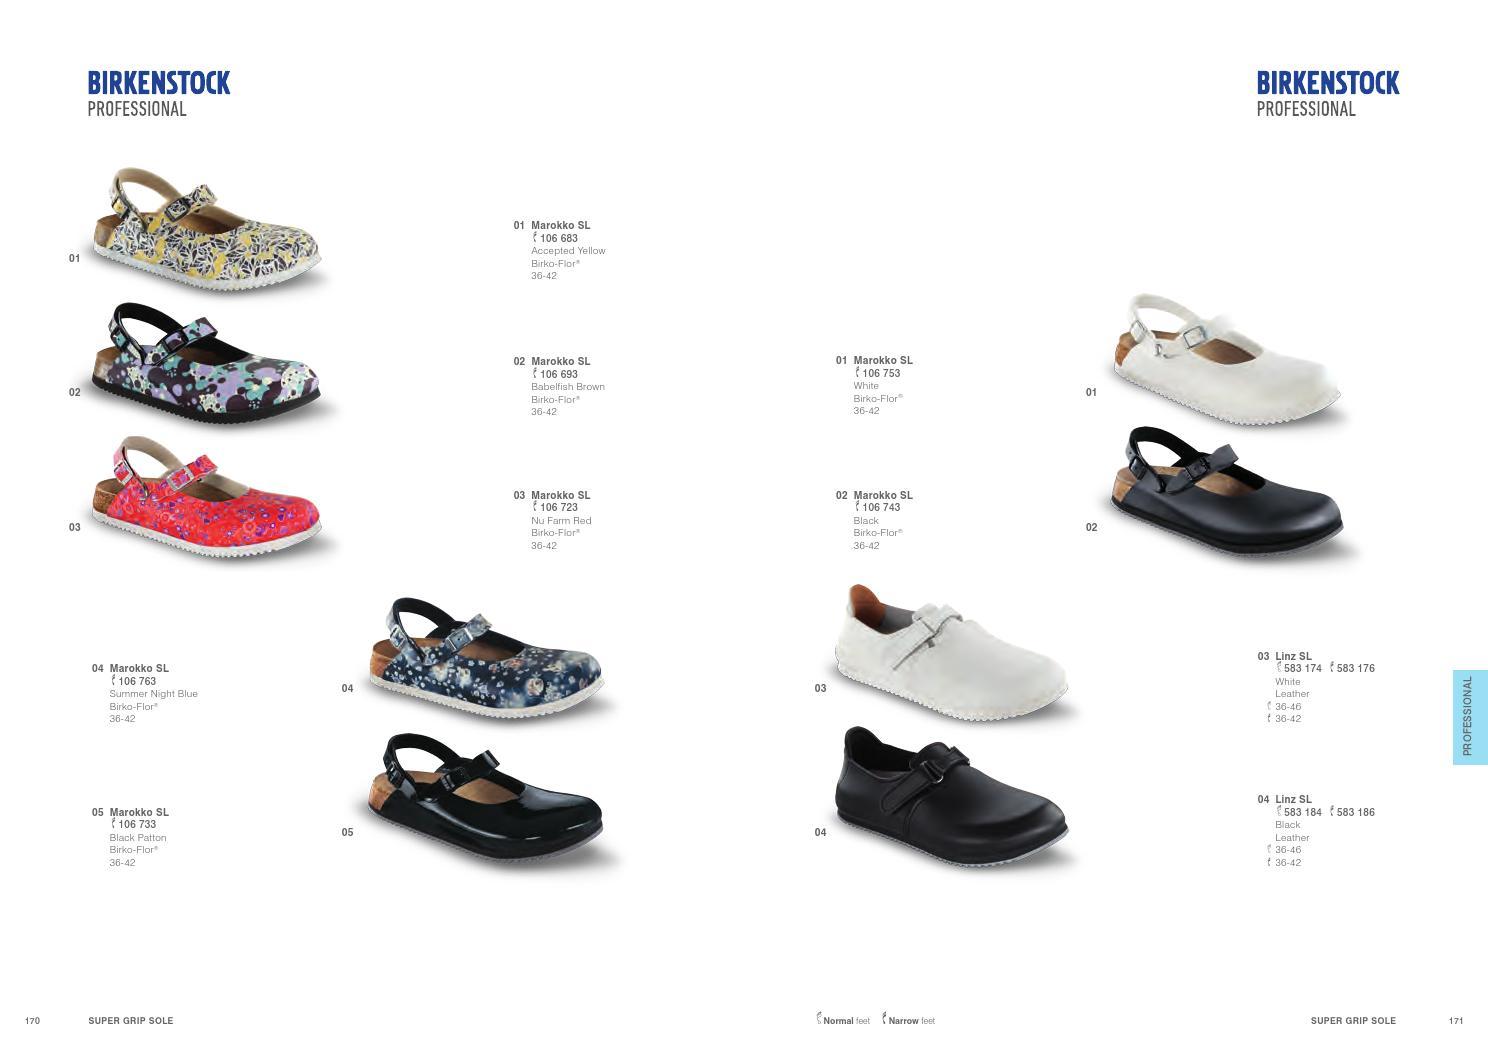 d3d400e89c69 Birkenstock katalog 2014 by Solid Media Group Denmark A S - issuu